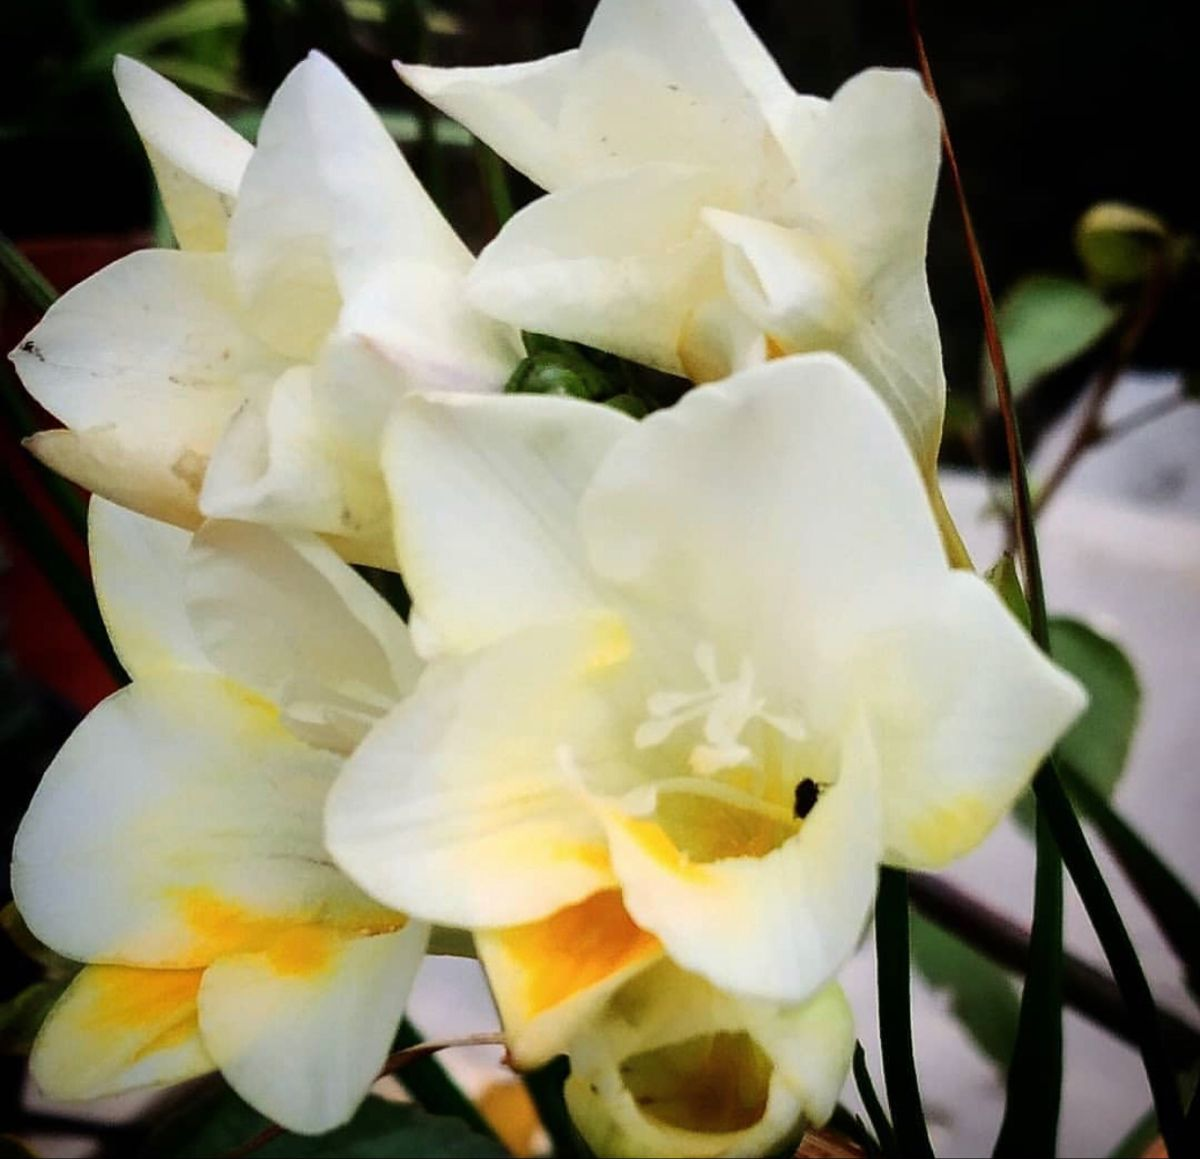 Freesia Flower In 2020 Freesia Flowers Wholesale Flowers Wholesale Flowers And Supplies